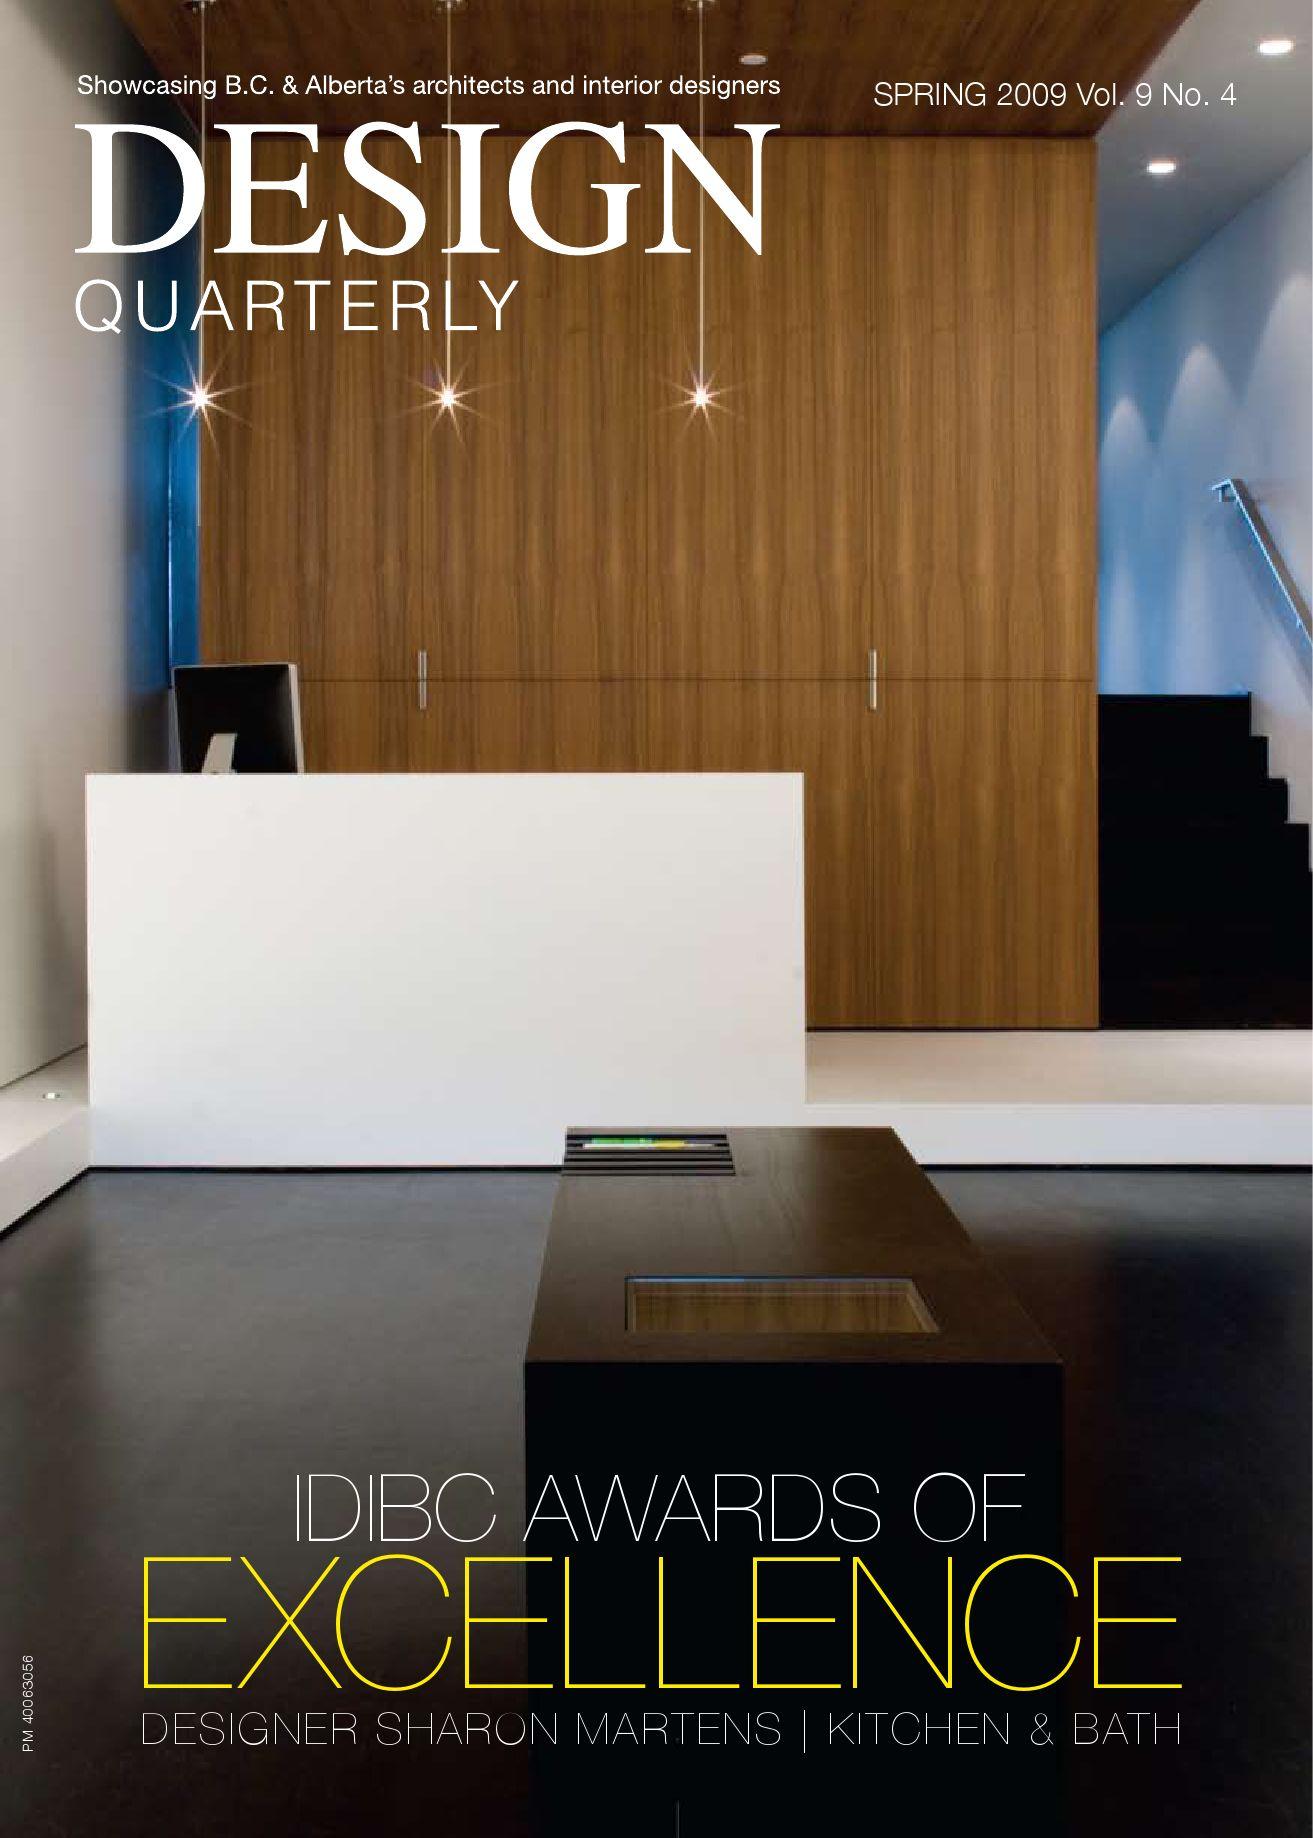 251153cbfb3 Design Quarterly Spring 2009 by MediaEdge - issuu